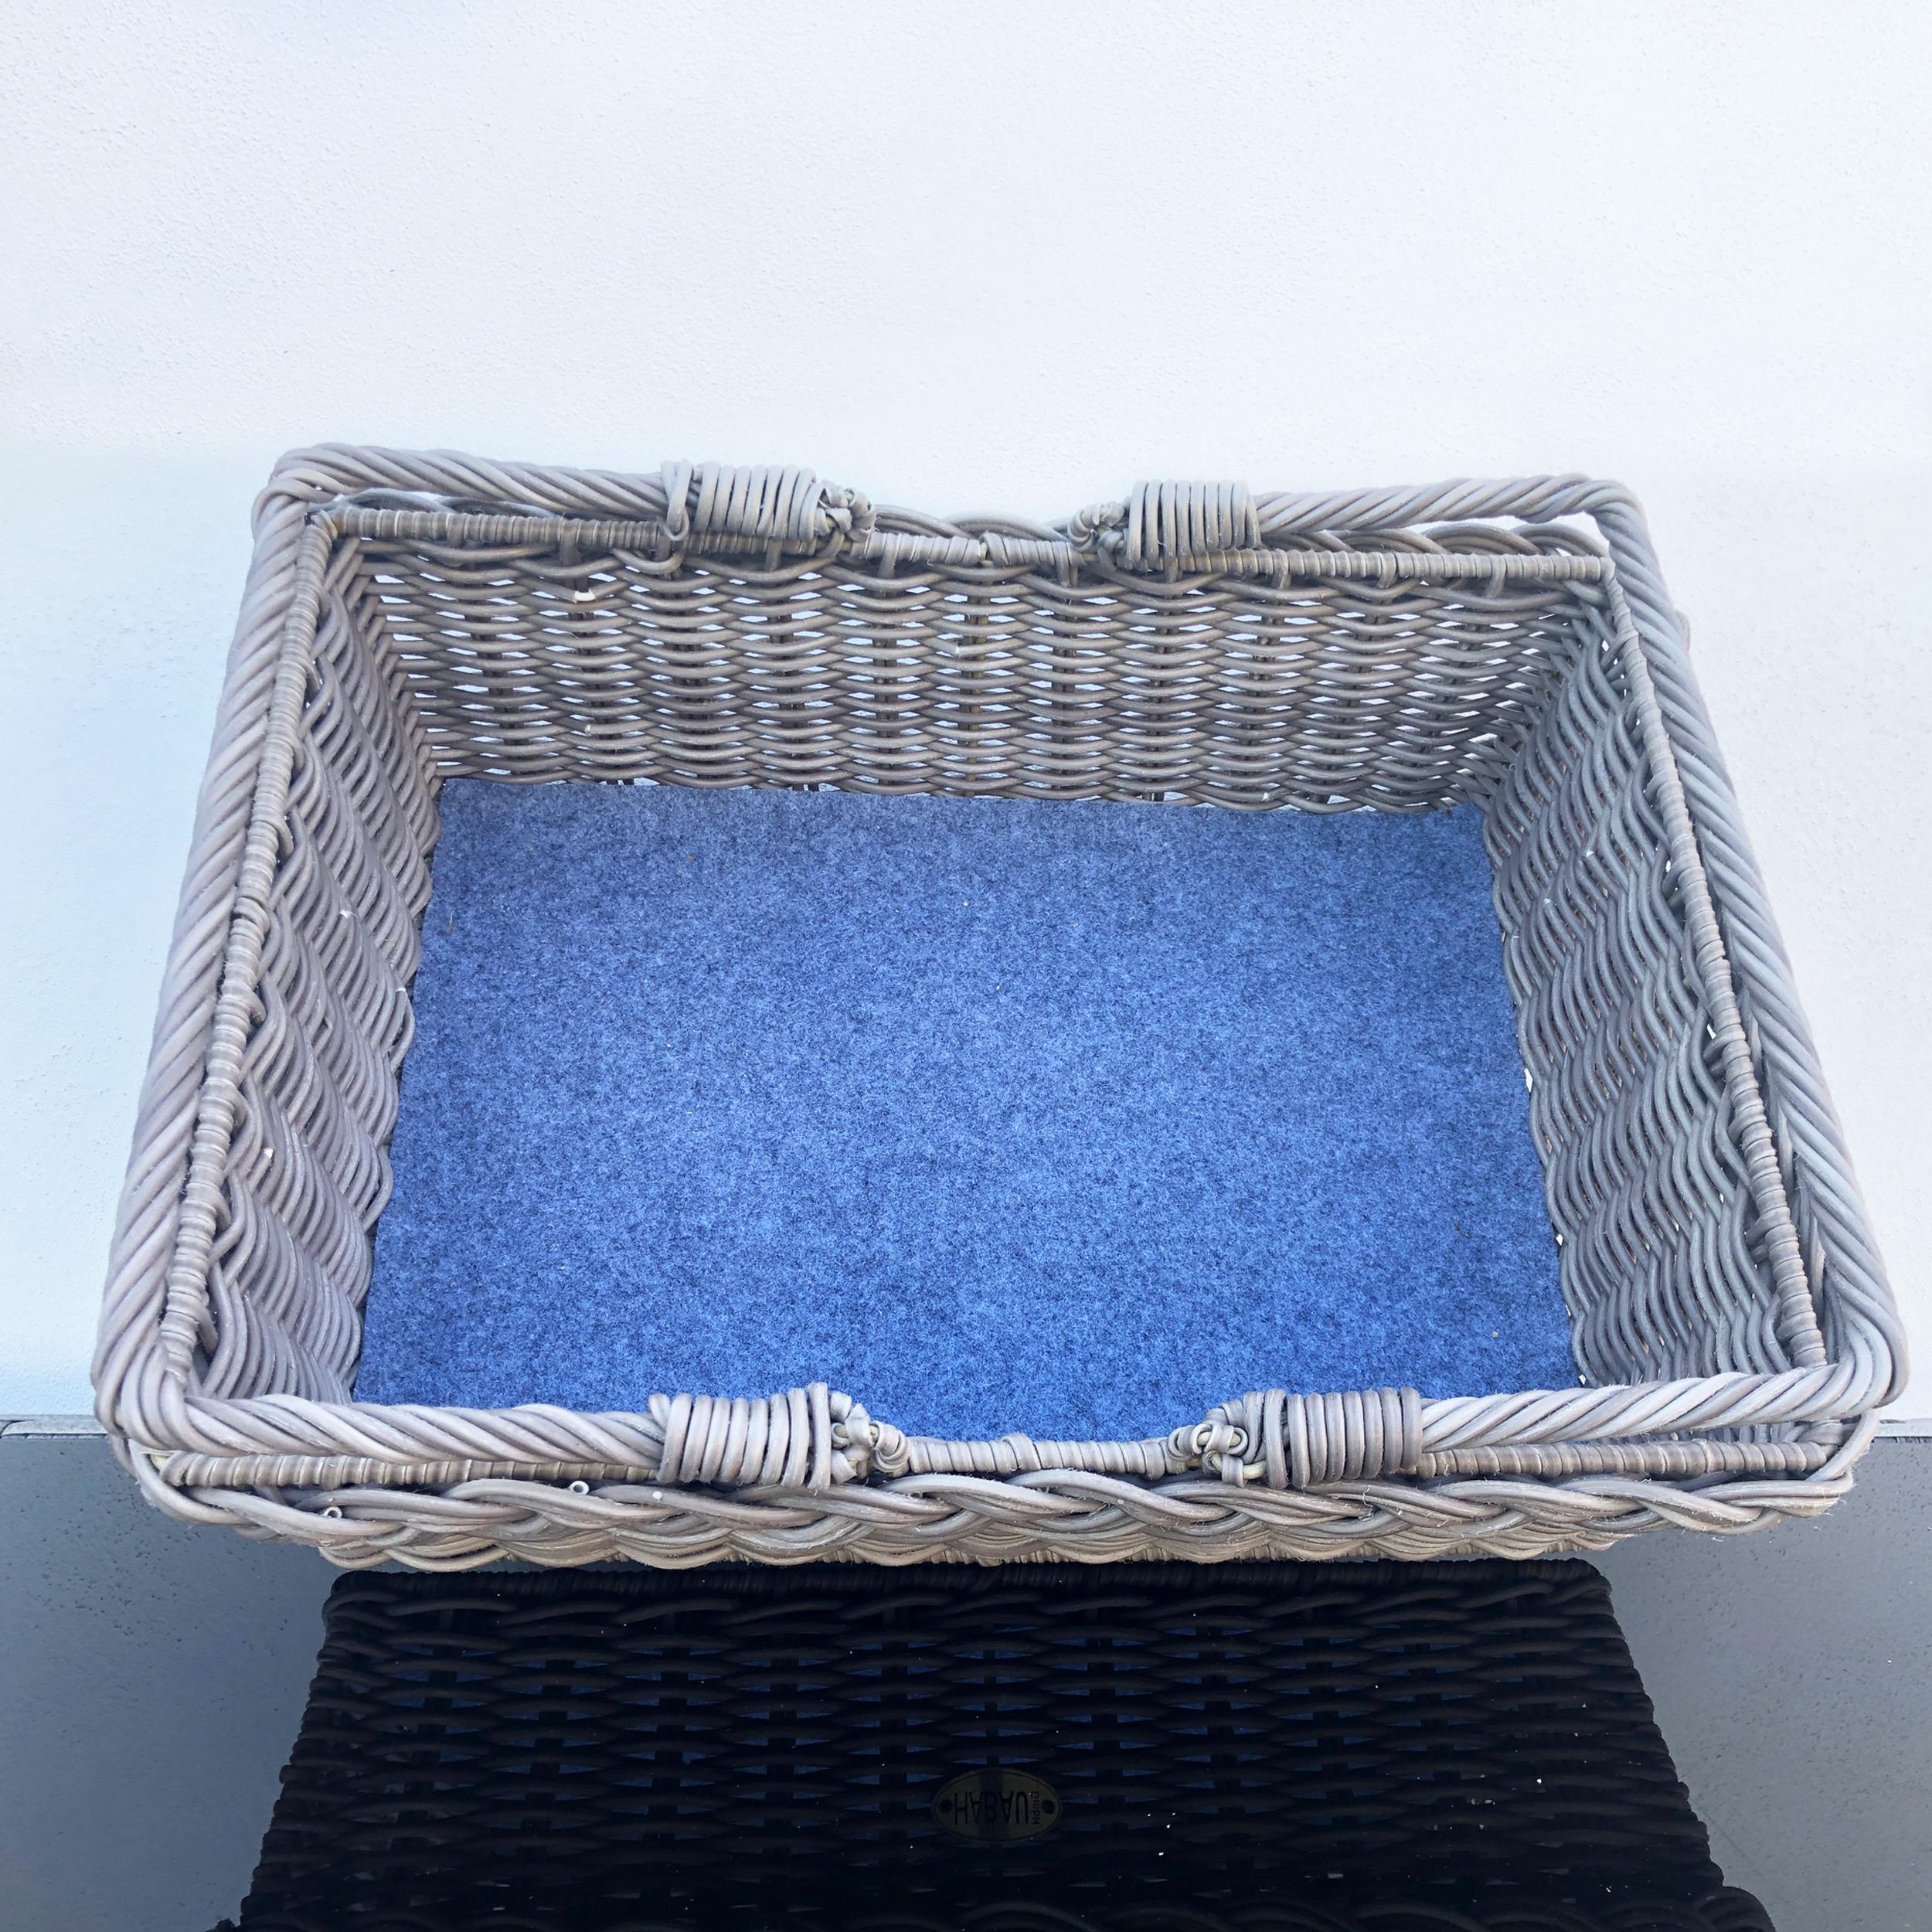 HABAU Korbtablett aus Polyethylen mit herausnehmbarem Filzboden - 3171